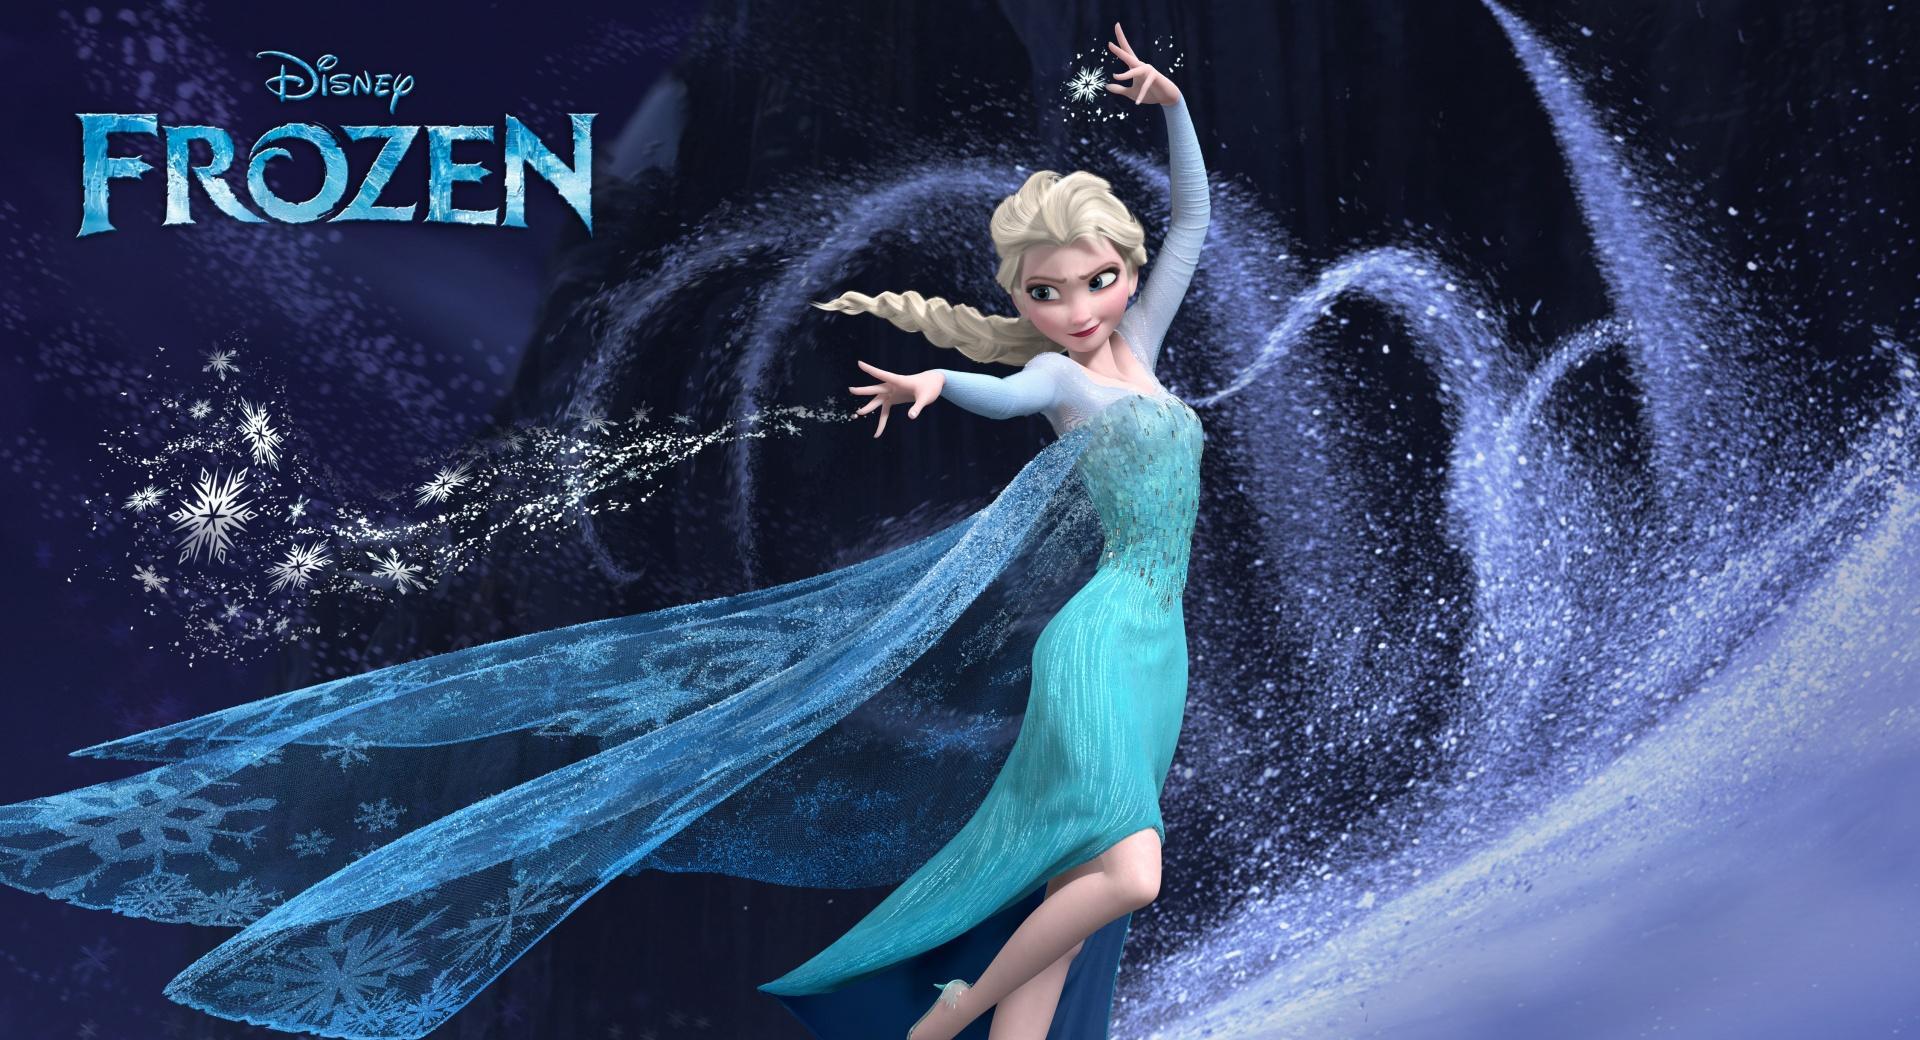 Frozen Elsa wallpapers HD quality